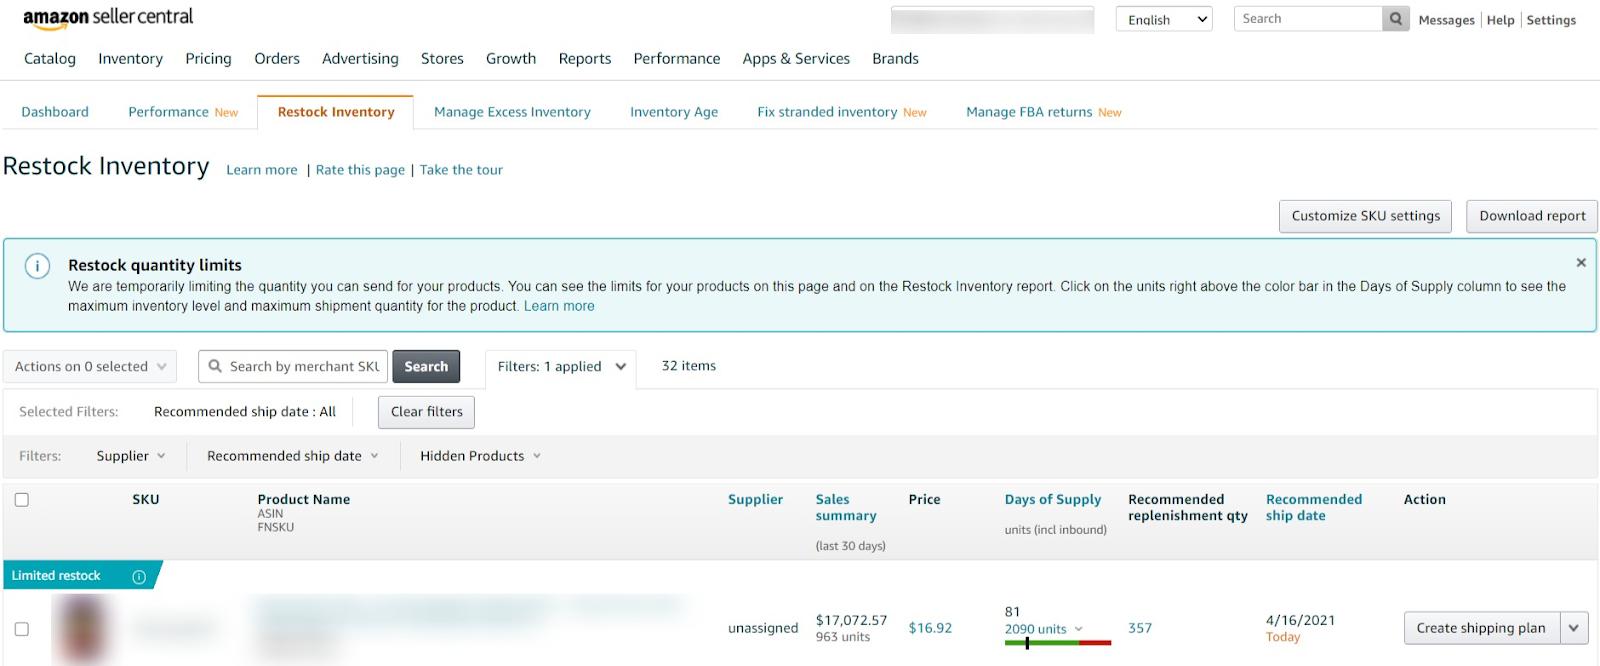 Amazon's restock inventory dashboard